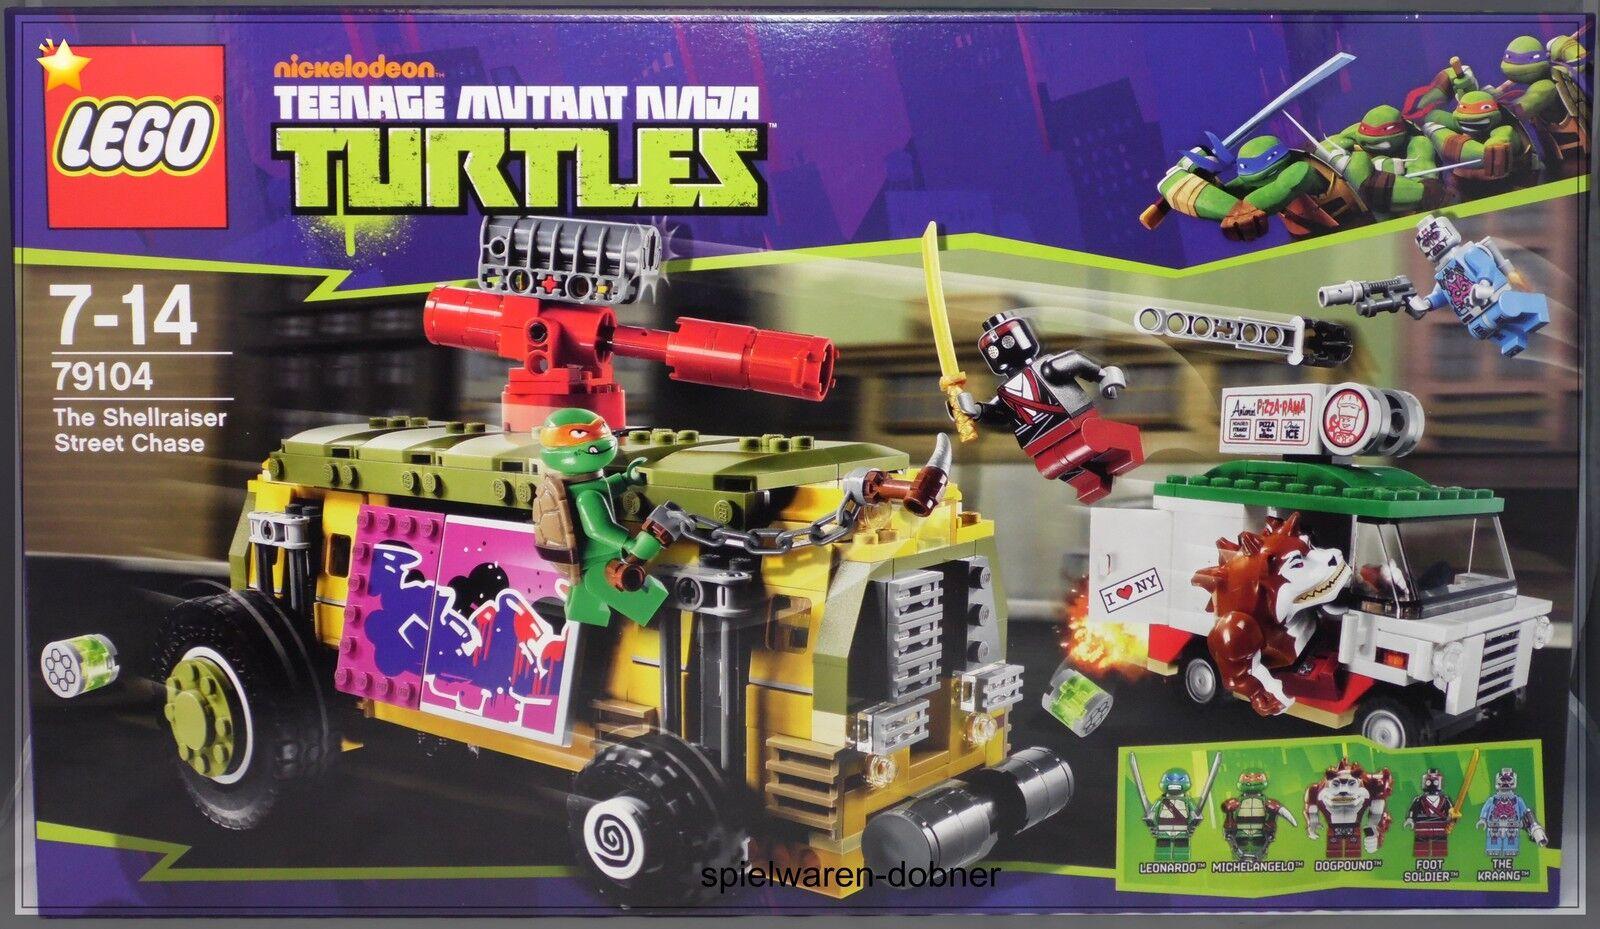 LEGO 79104 tenage MUTANTE TARTARUGHE NINJA THE SHELLRAISER Street CHASE NUOVO